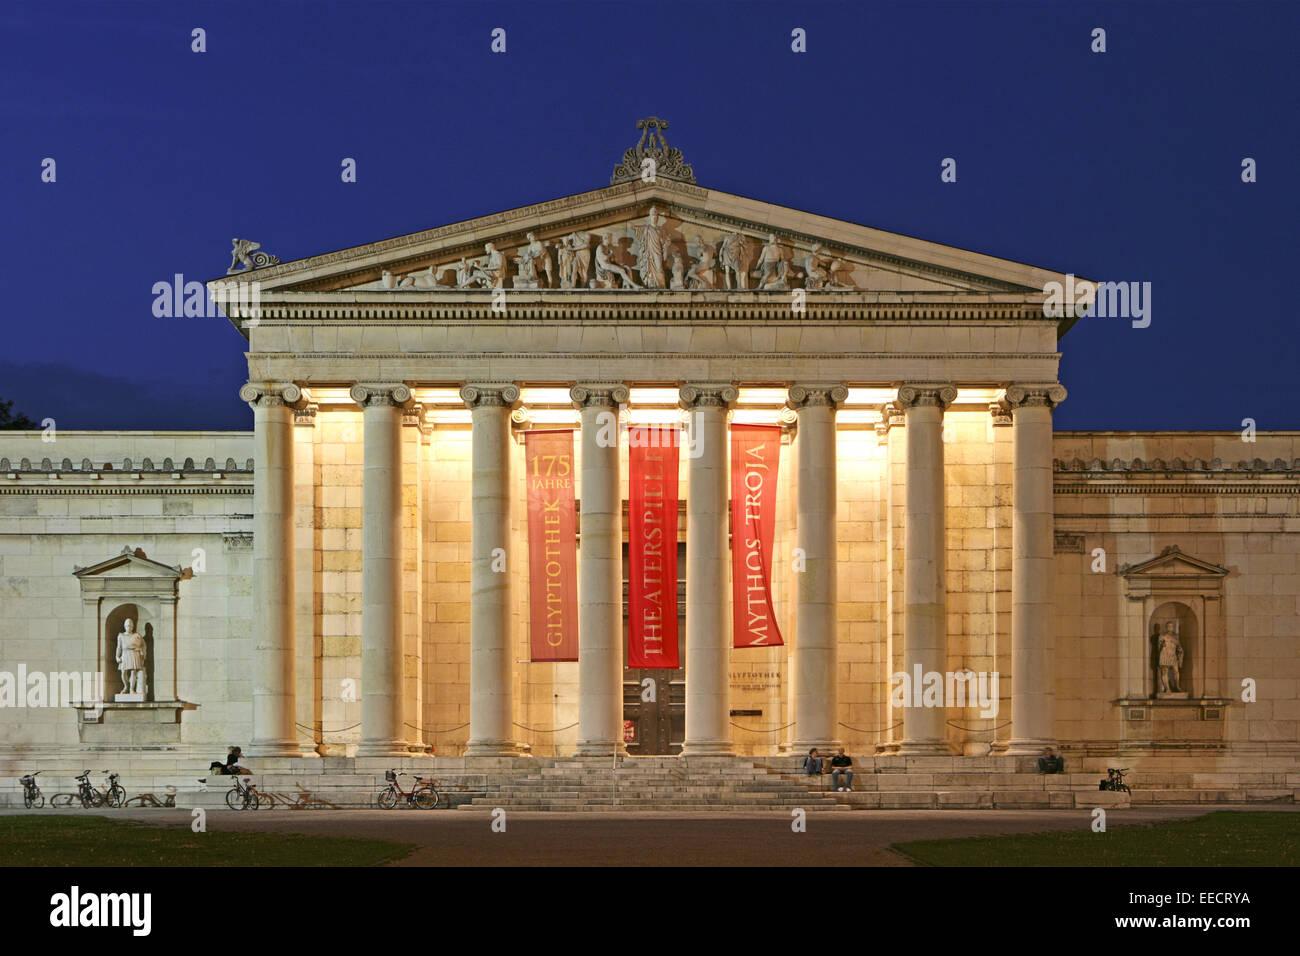 Architektur, Aussenaufnahme, Bauwerk, Bauwerke, Bayern, Deutschland, Gebaeude, Gebäude, Glyptothek, Haeuser, - Stock Image